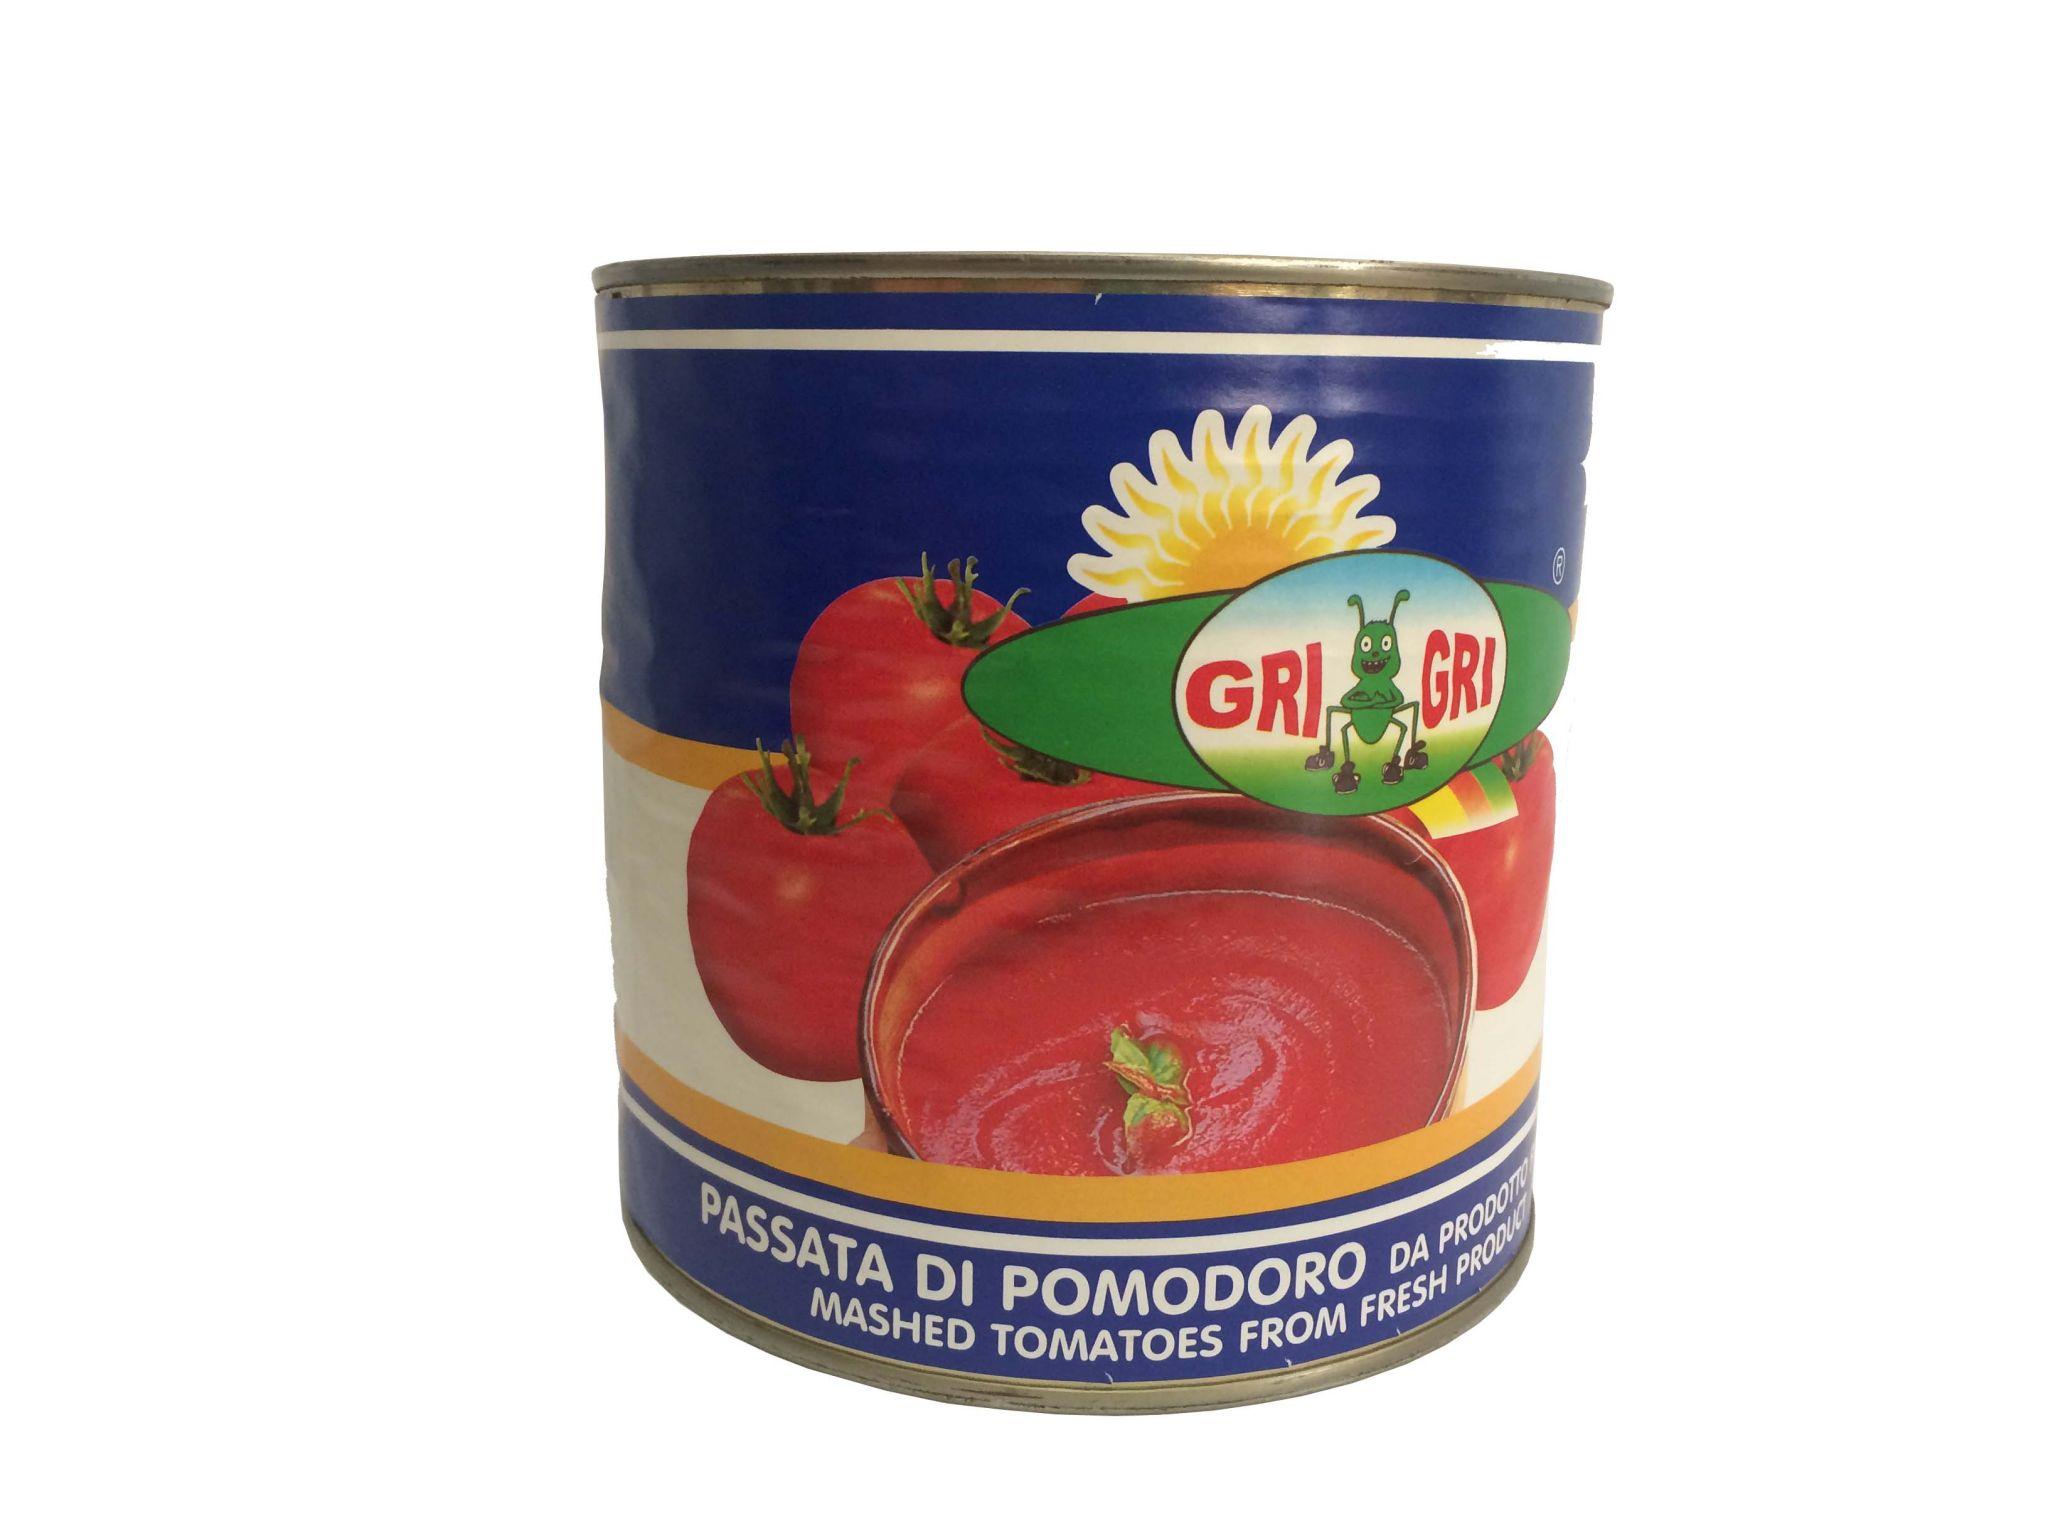 Ittrade - Passata Di Pomodoro 6 x 2